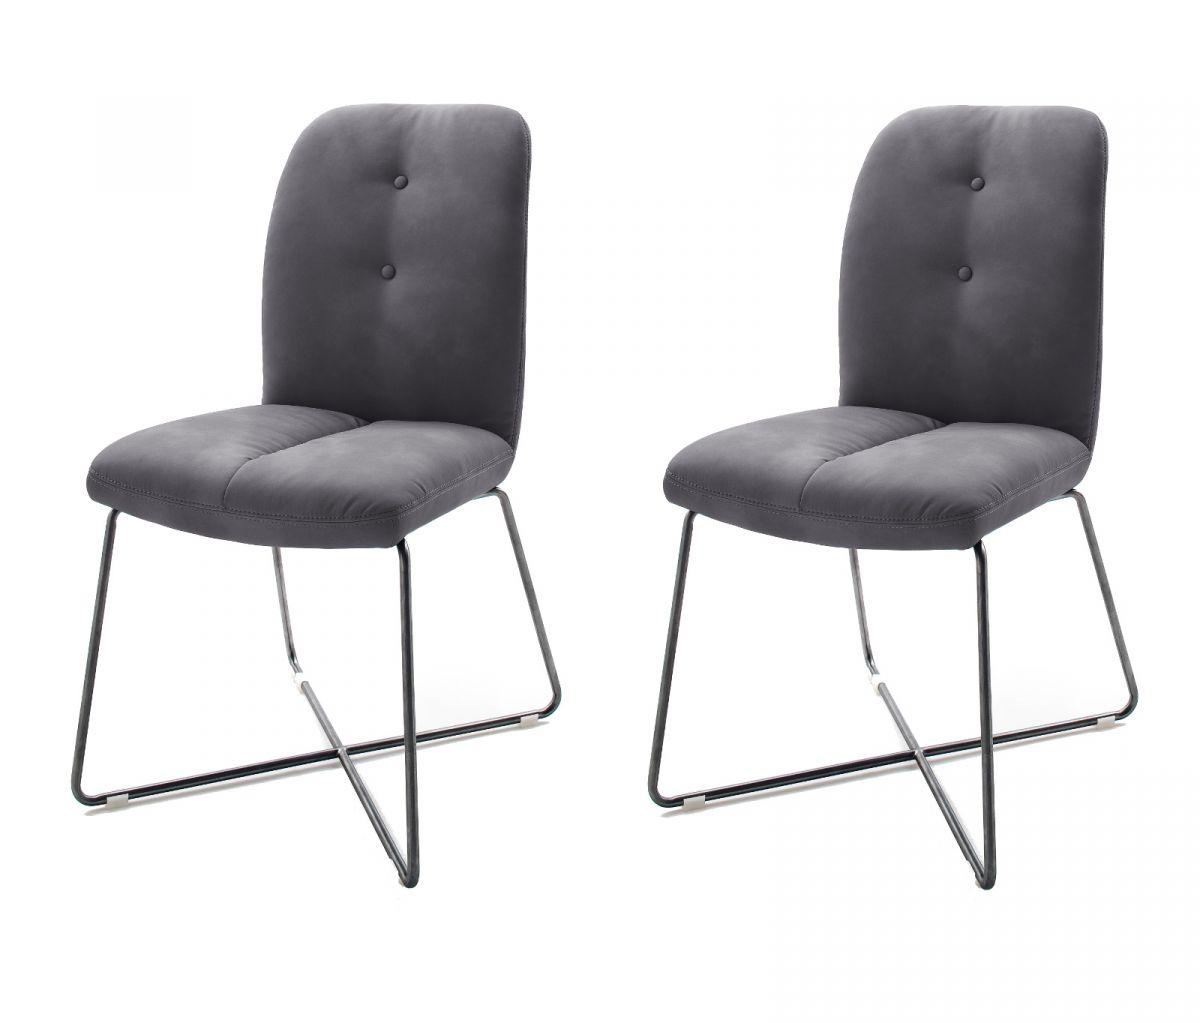 2 x Stuhl Tessera Grau X-Kufen Gestell Kunstleder